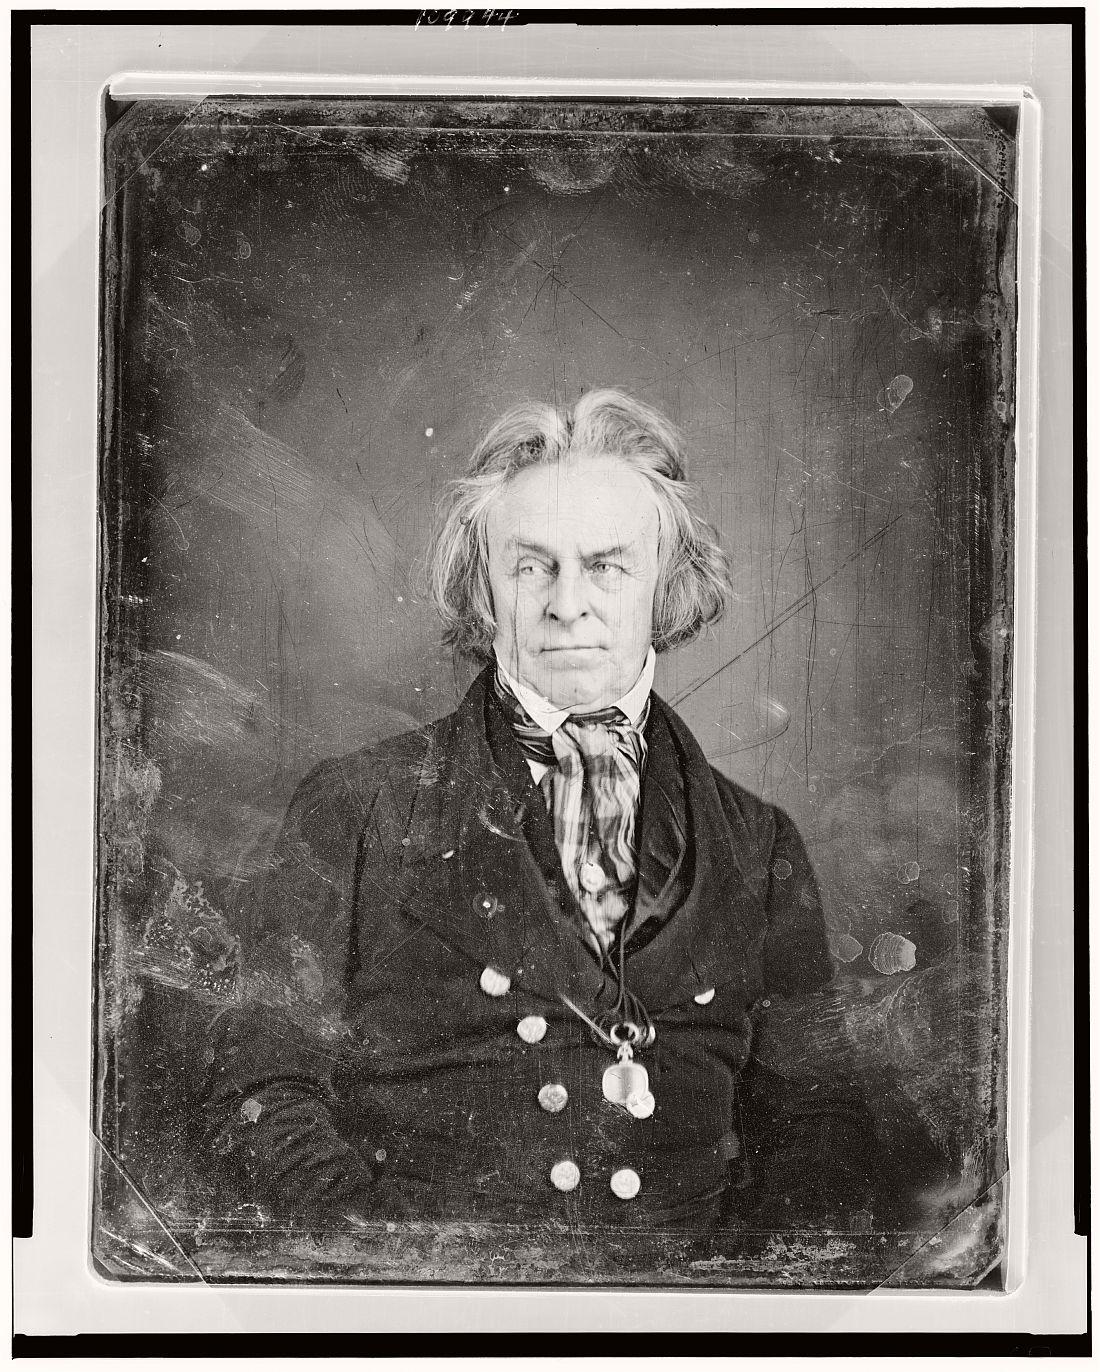 vintage-daguerreotype-portraits-from-xix-century-1844-1860-29